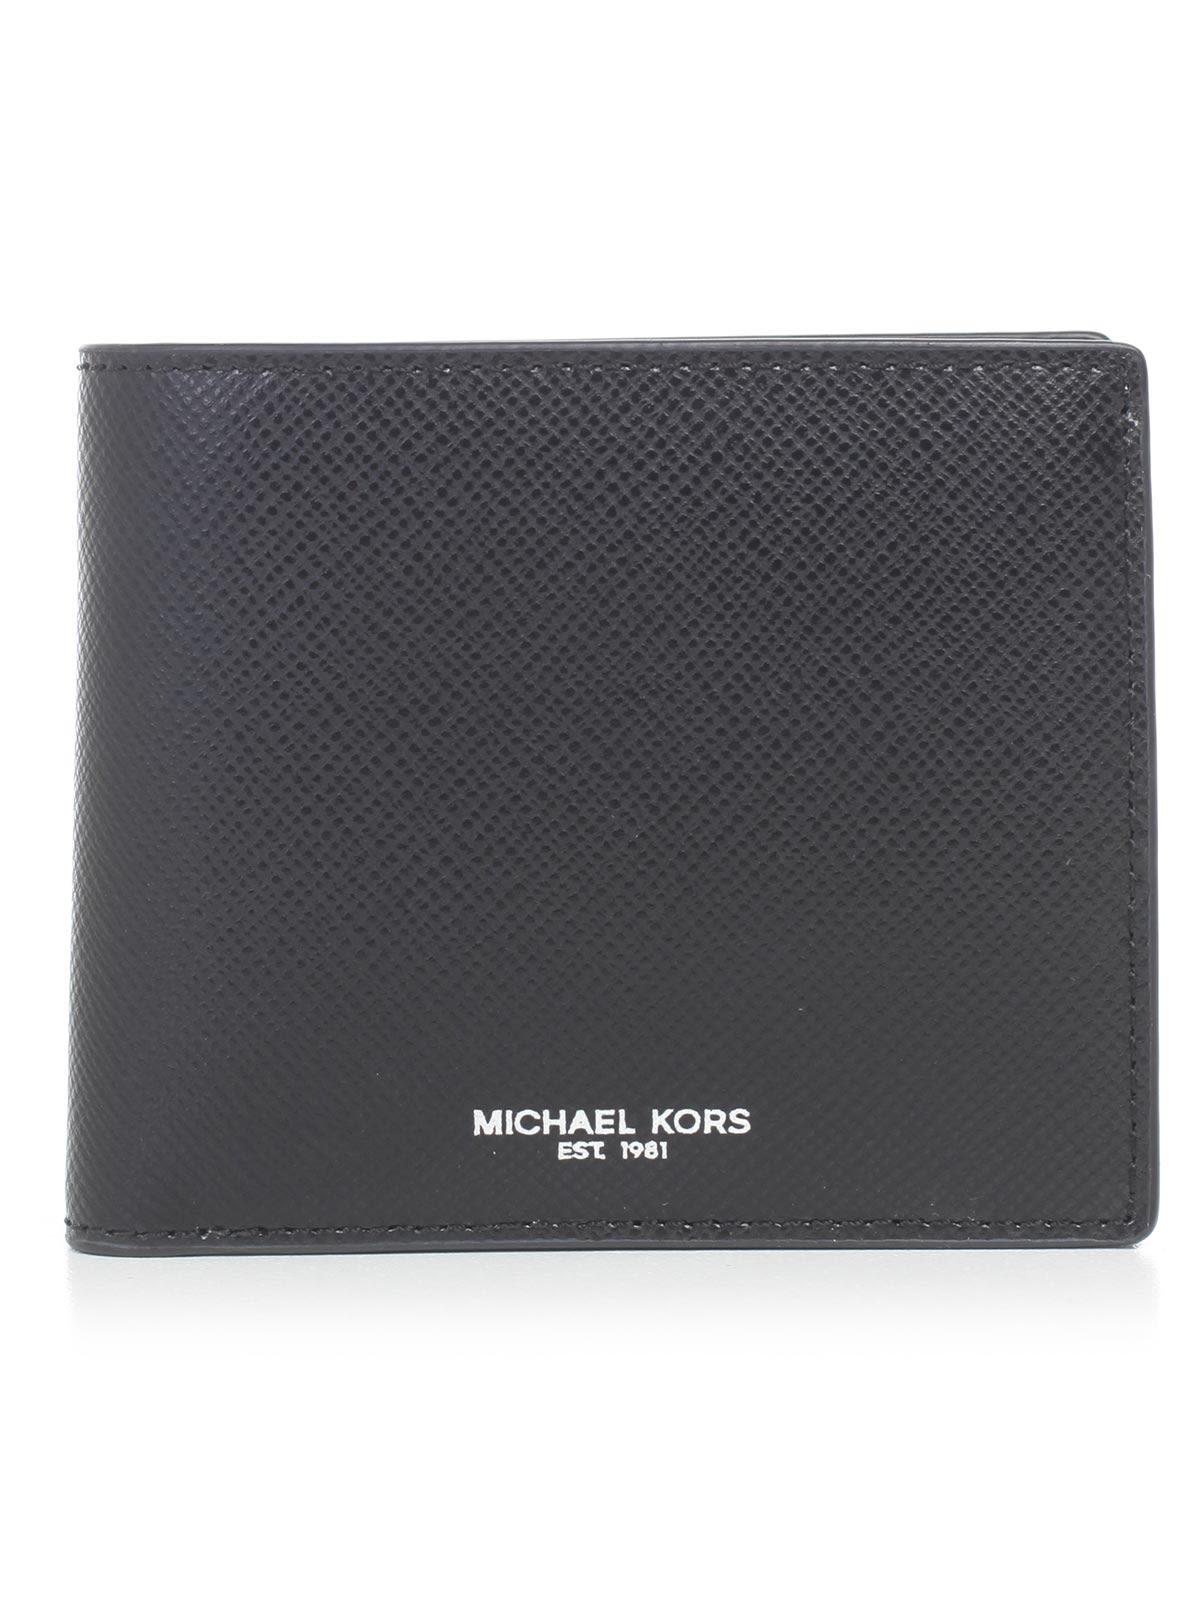 Michael Kors Harrison Foldover Wallet